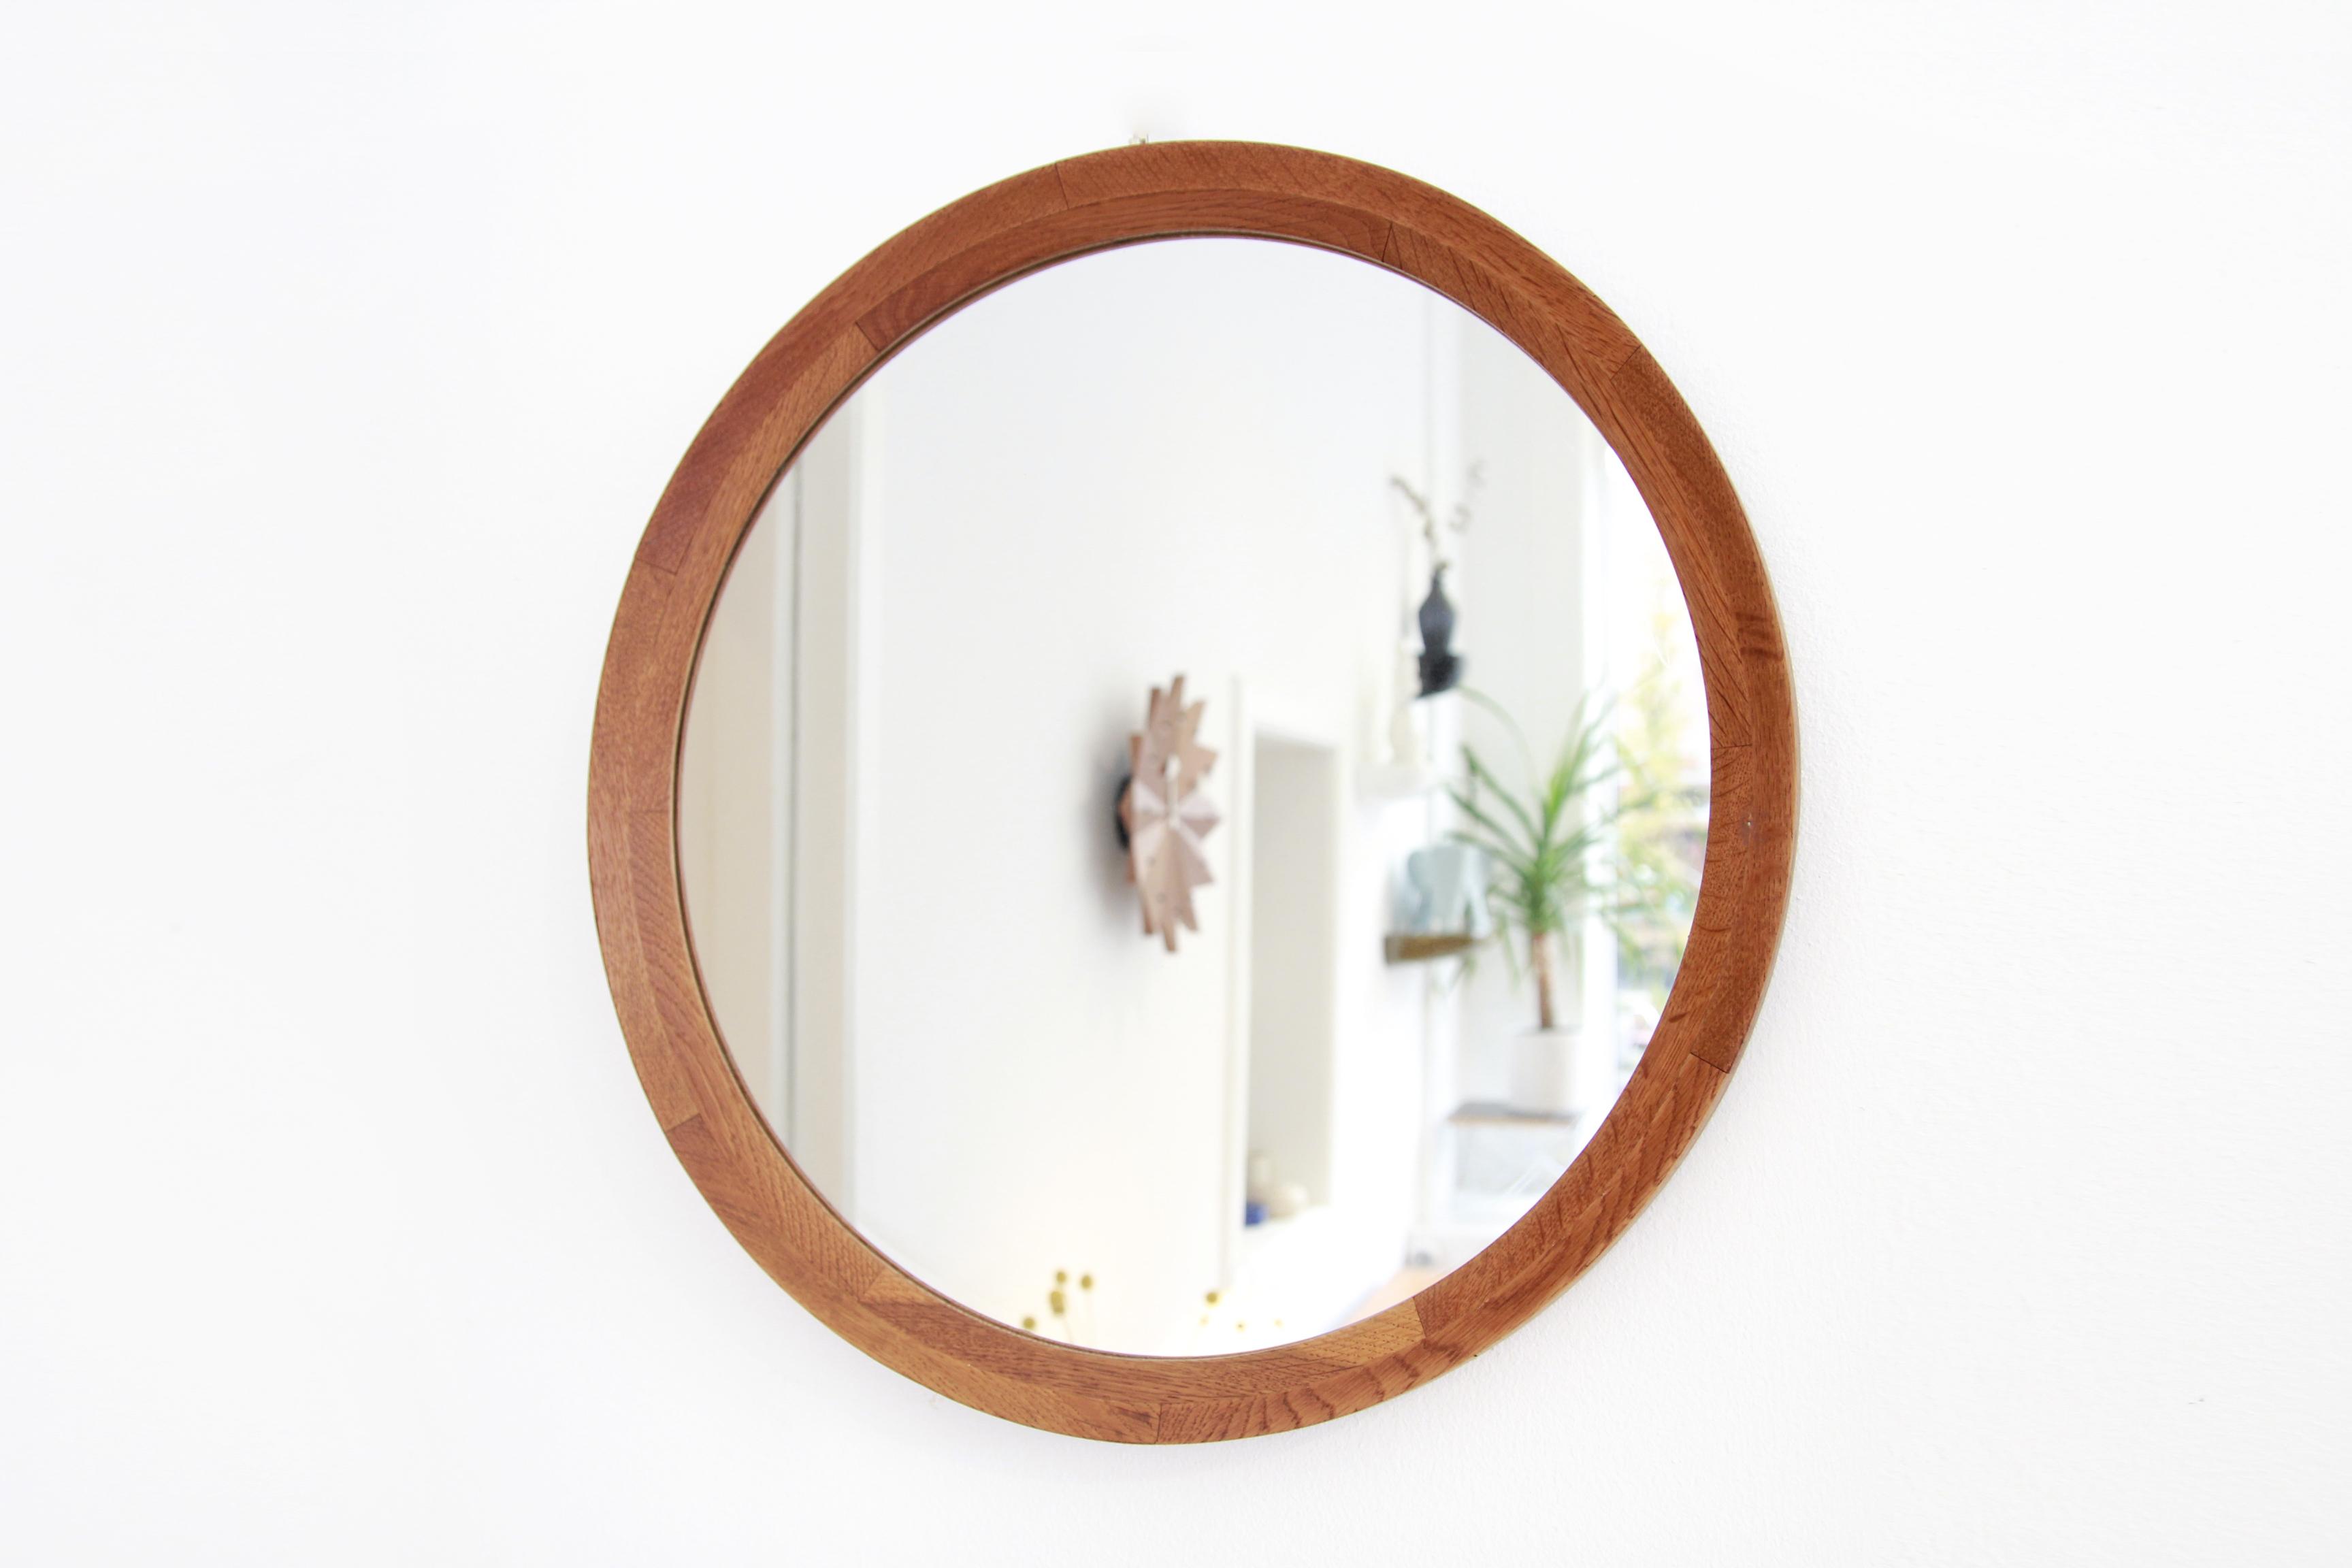 Ronde Houten Spiegel : Ronde massief eiken houten deens design spiegel van ons